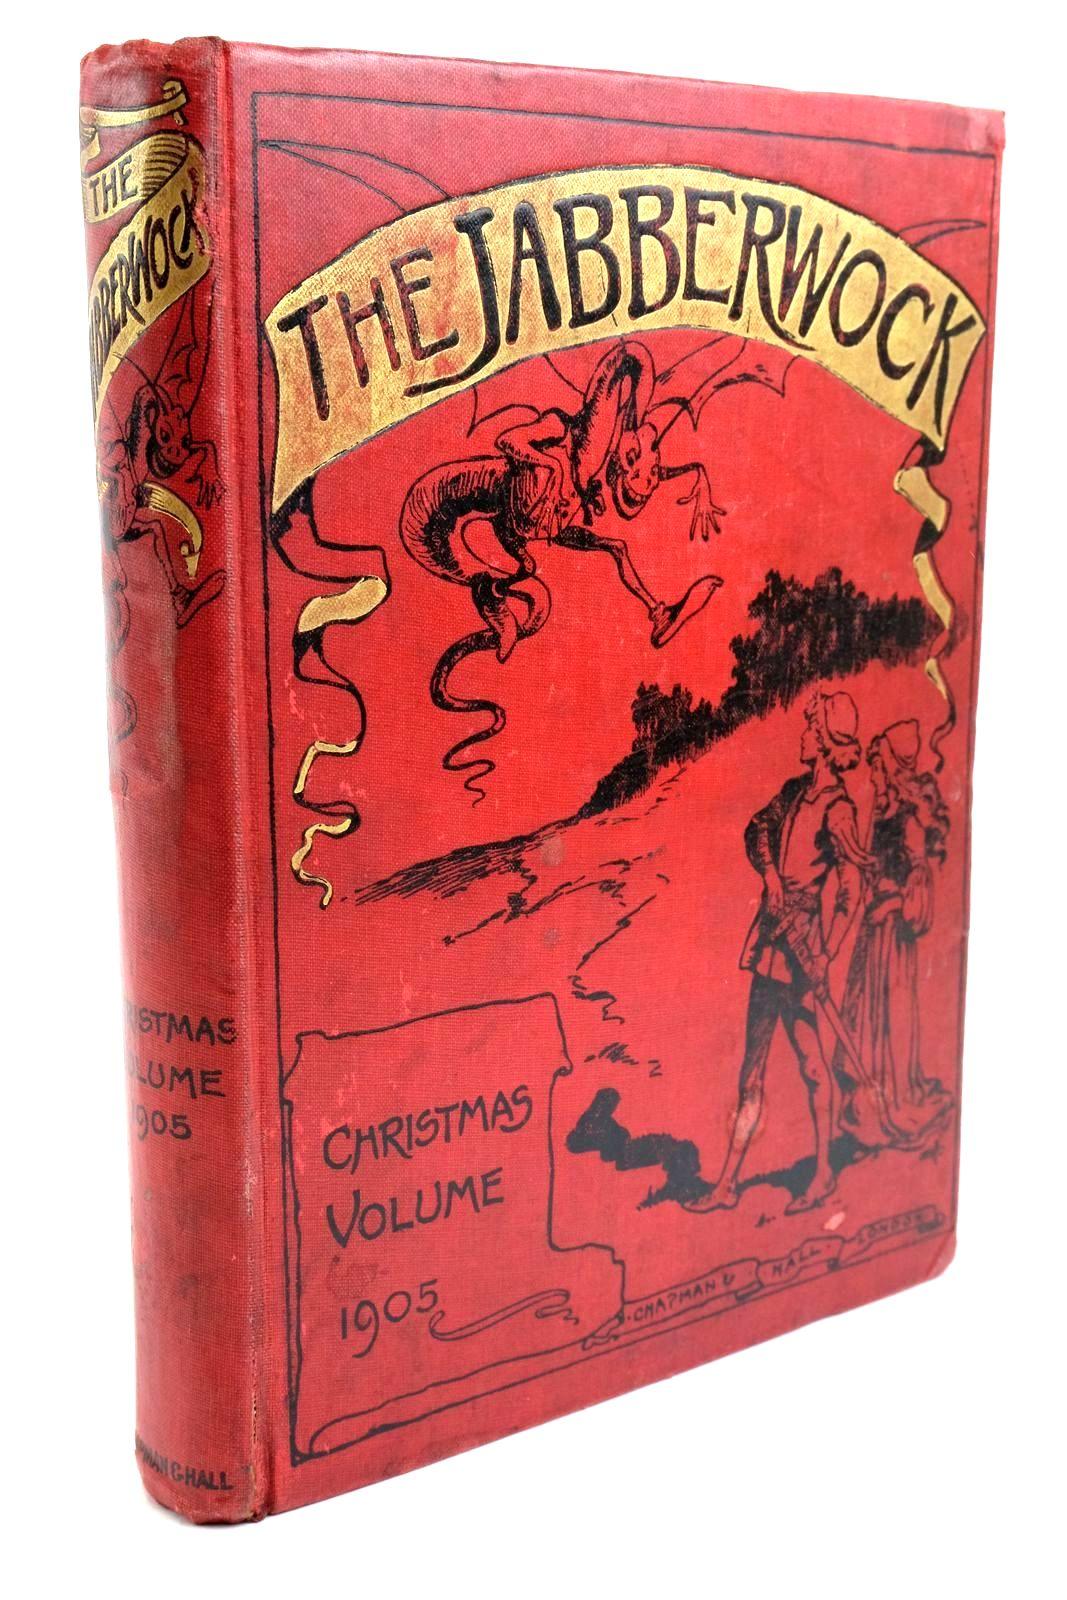 Photo of THE JABBERWOCK CHRISTMAS VOLUME 1905- Stock Number: 1321770